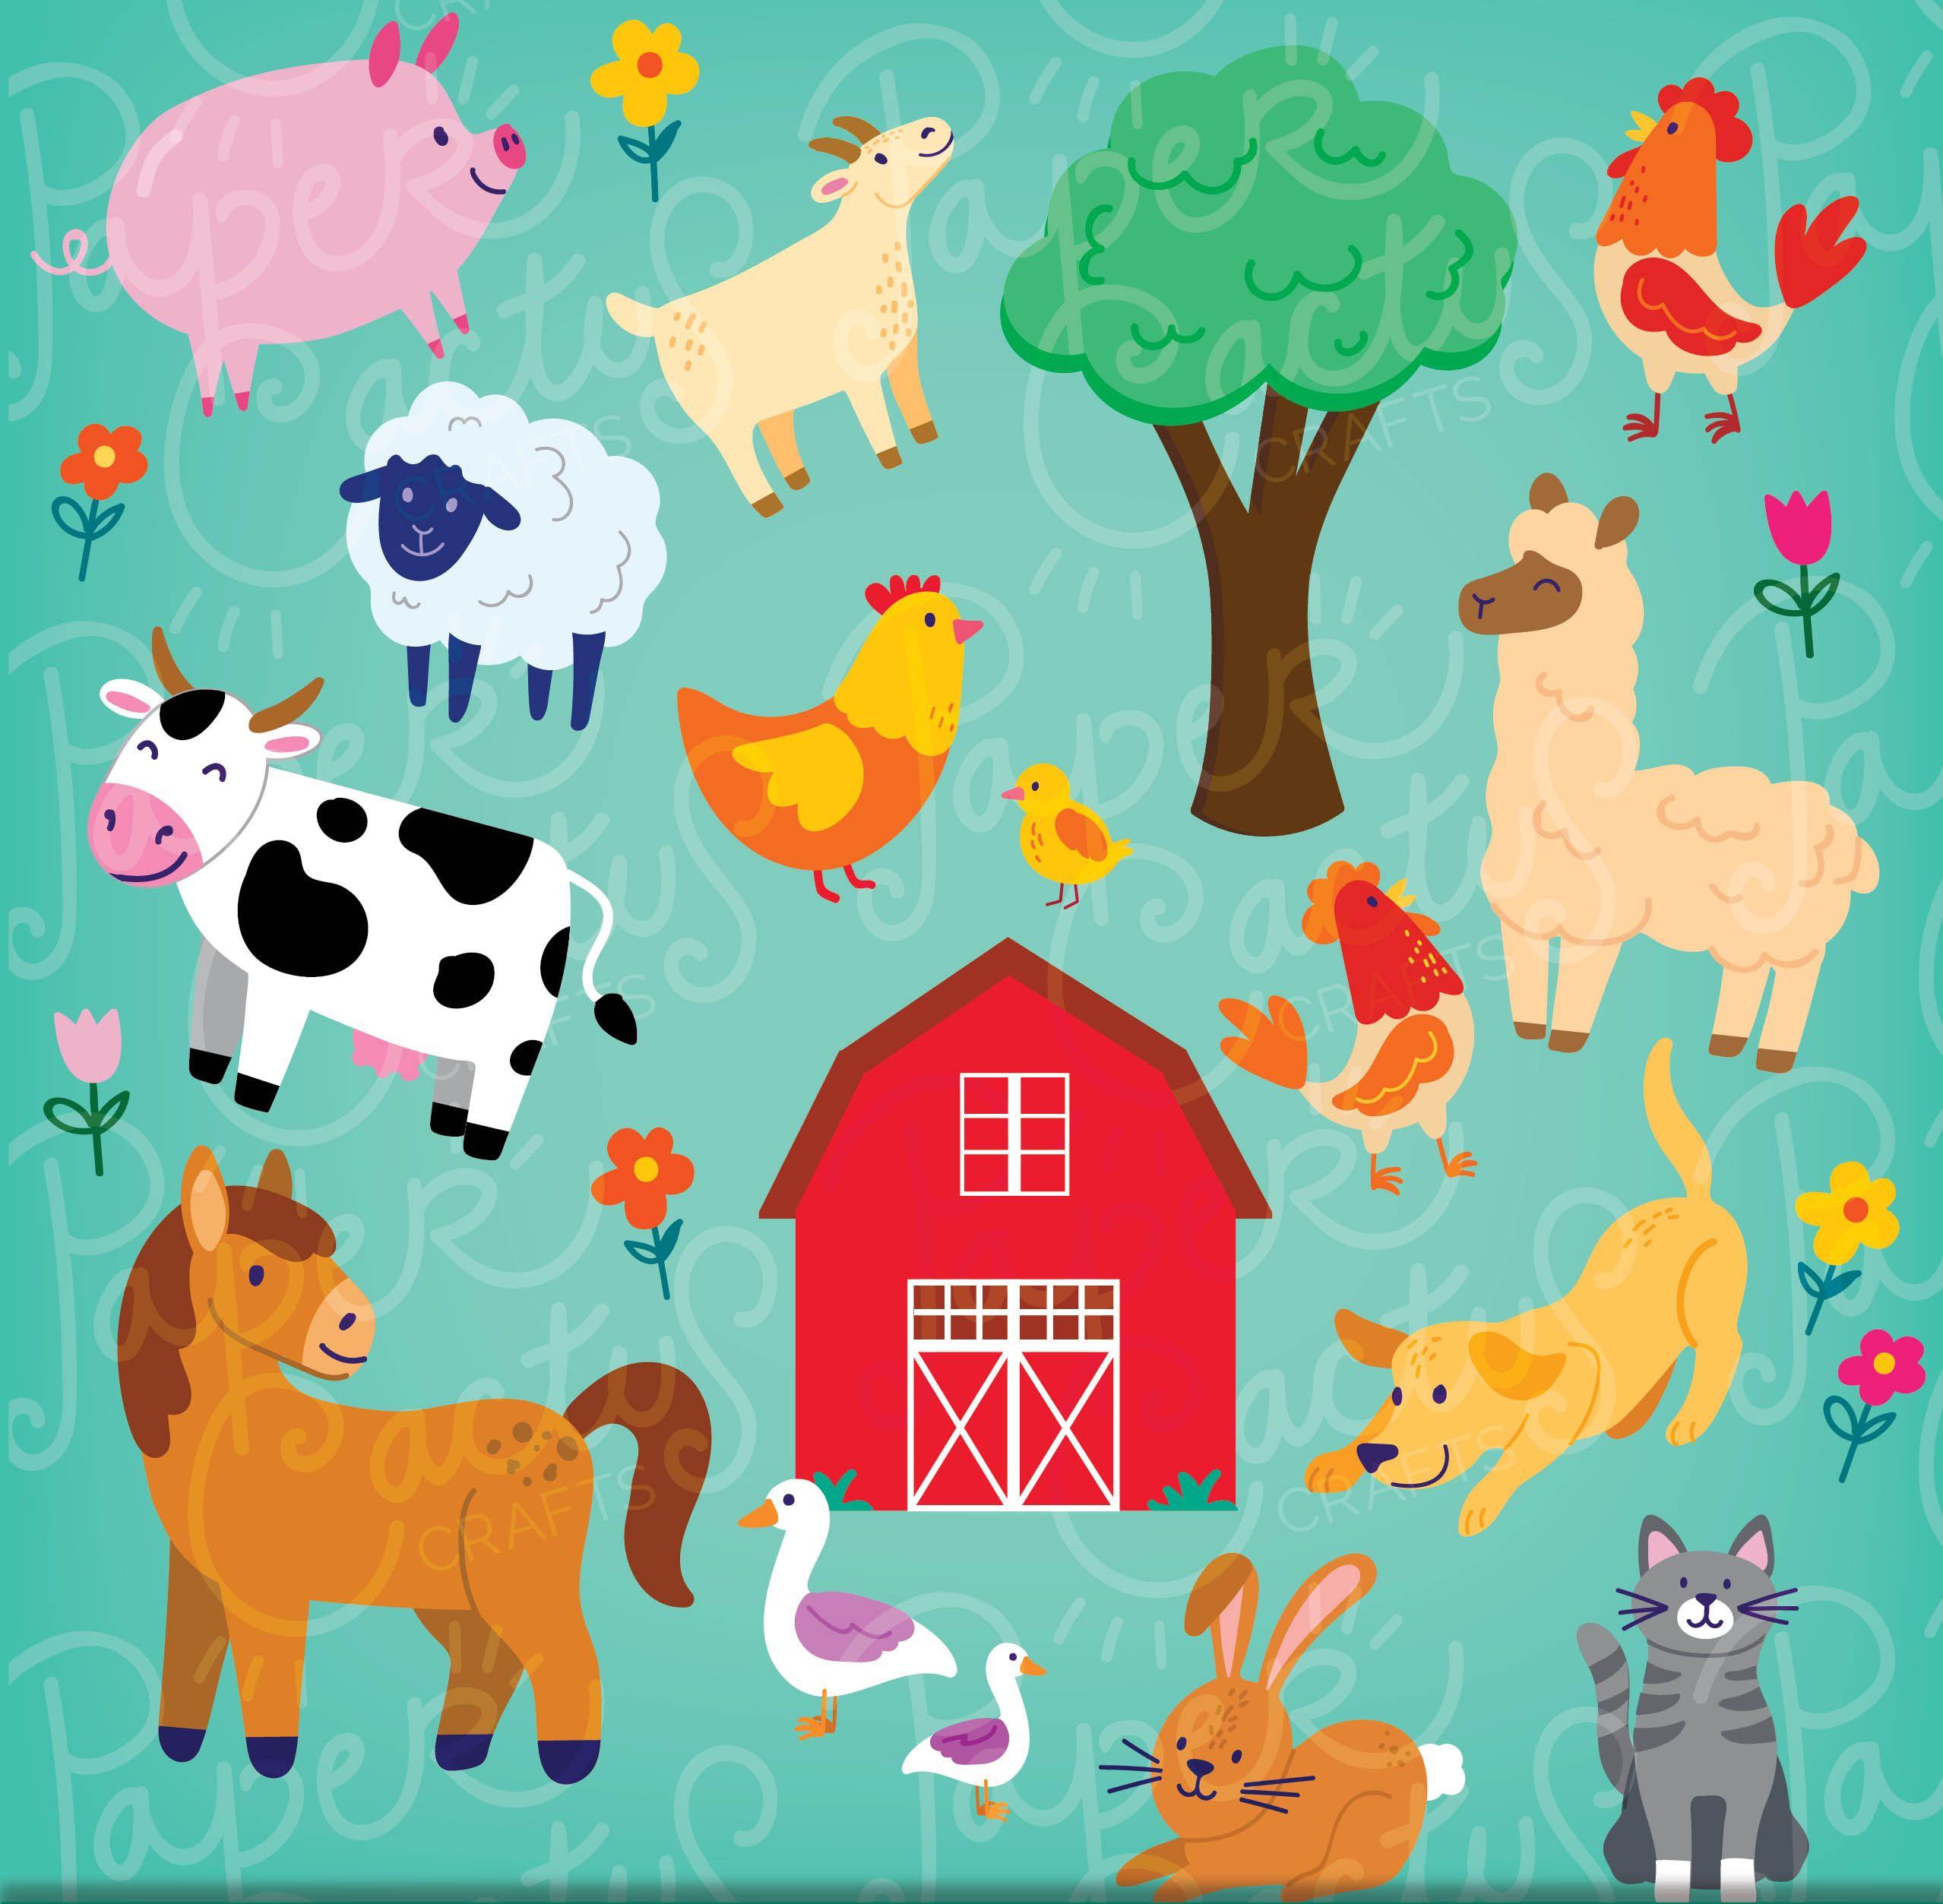 Farm Animals Clipart Instant Download Illustrated Great Etsy Farm Animals Clipart Animals Clipart Farm Animals